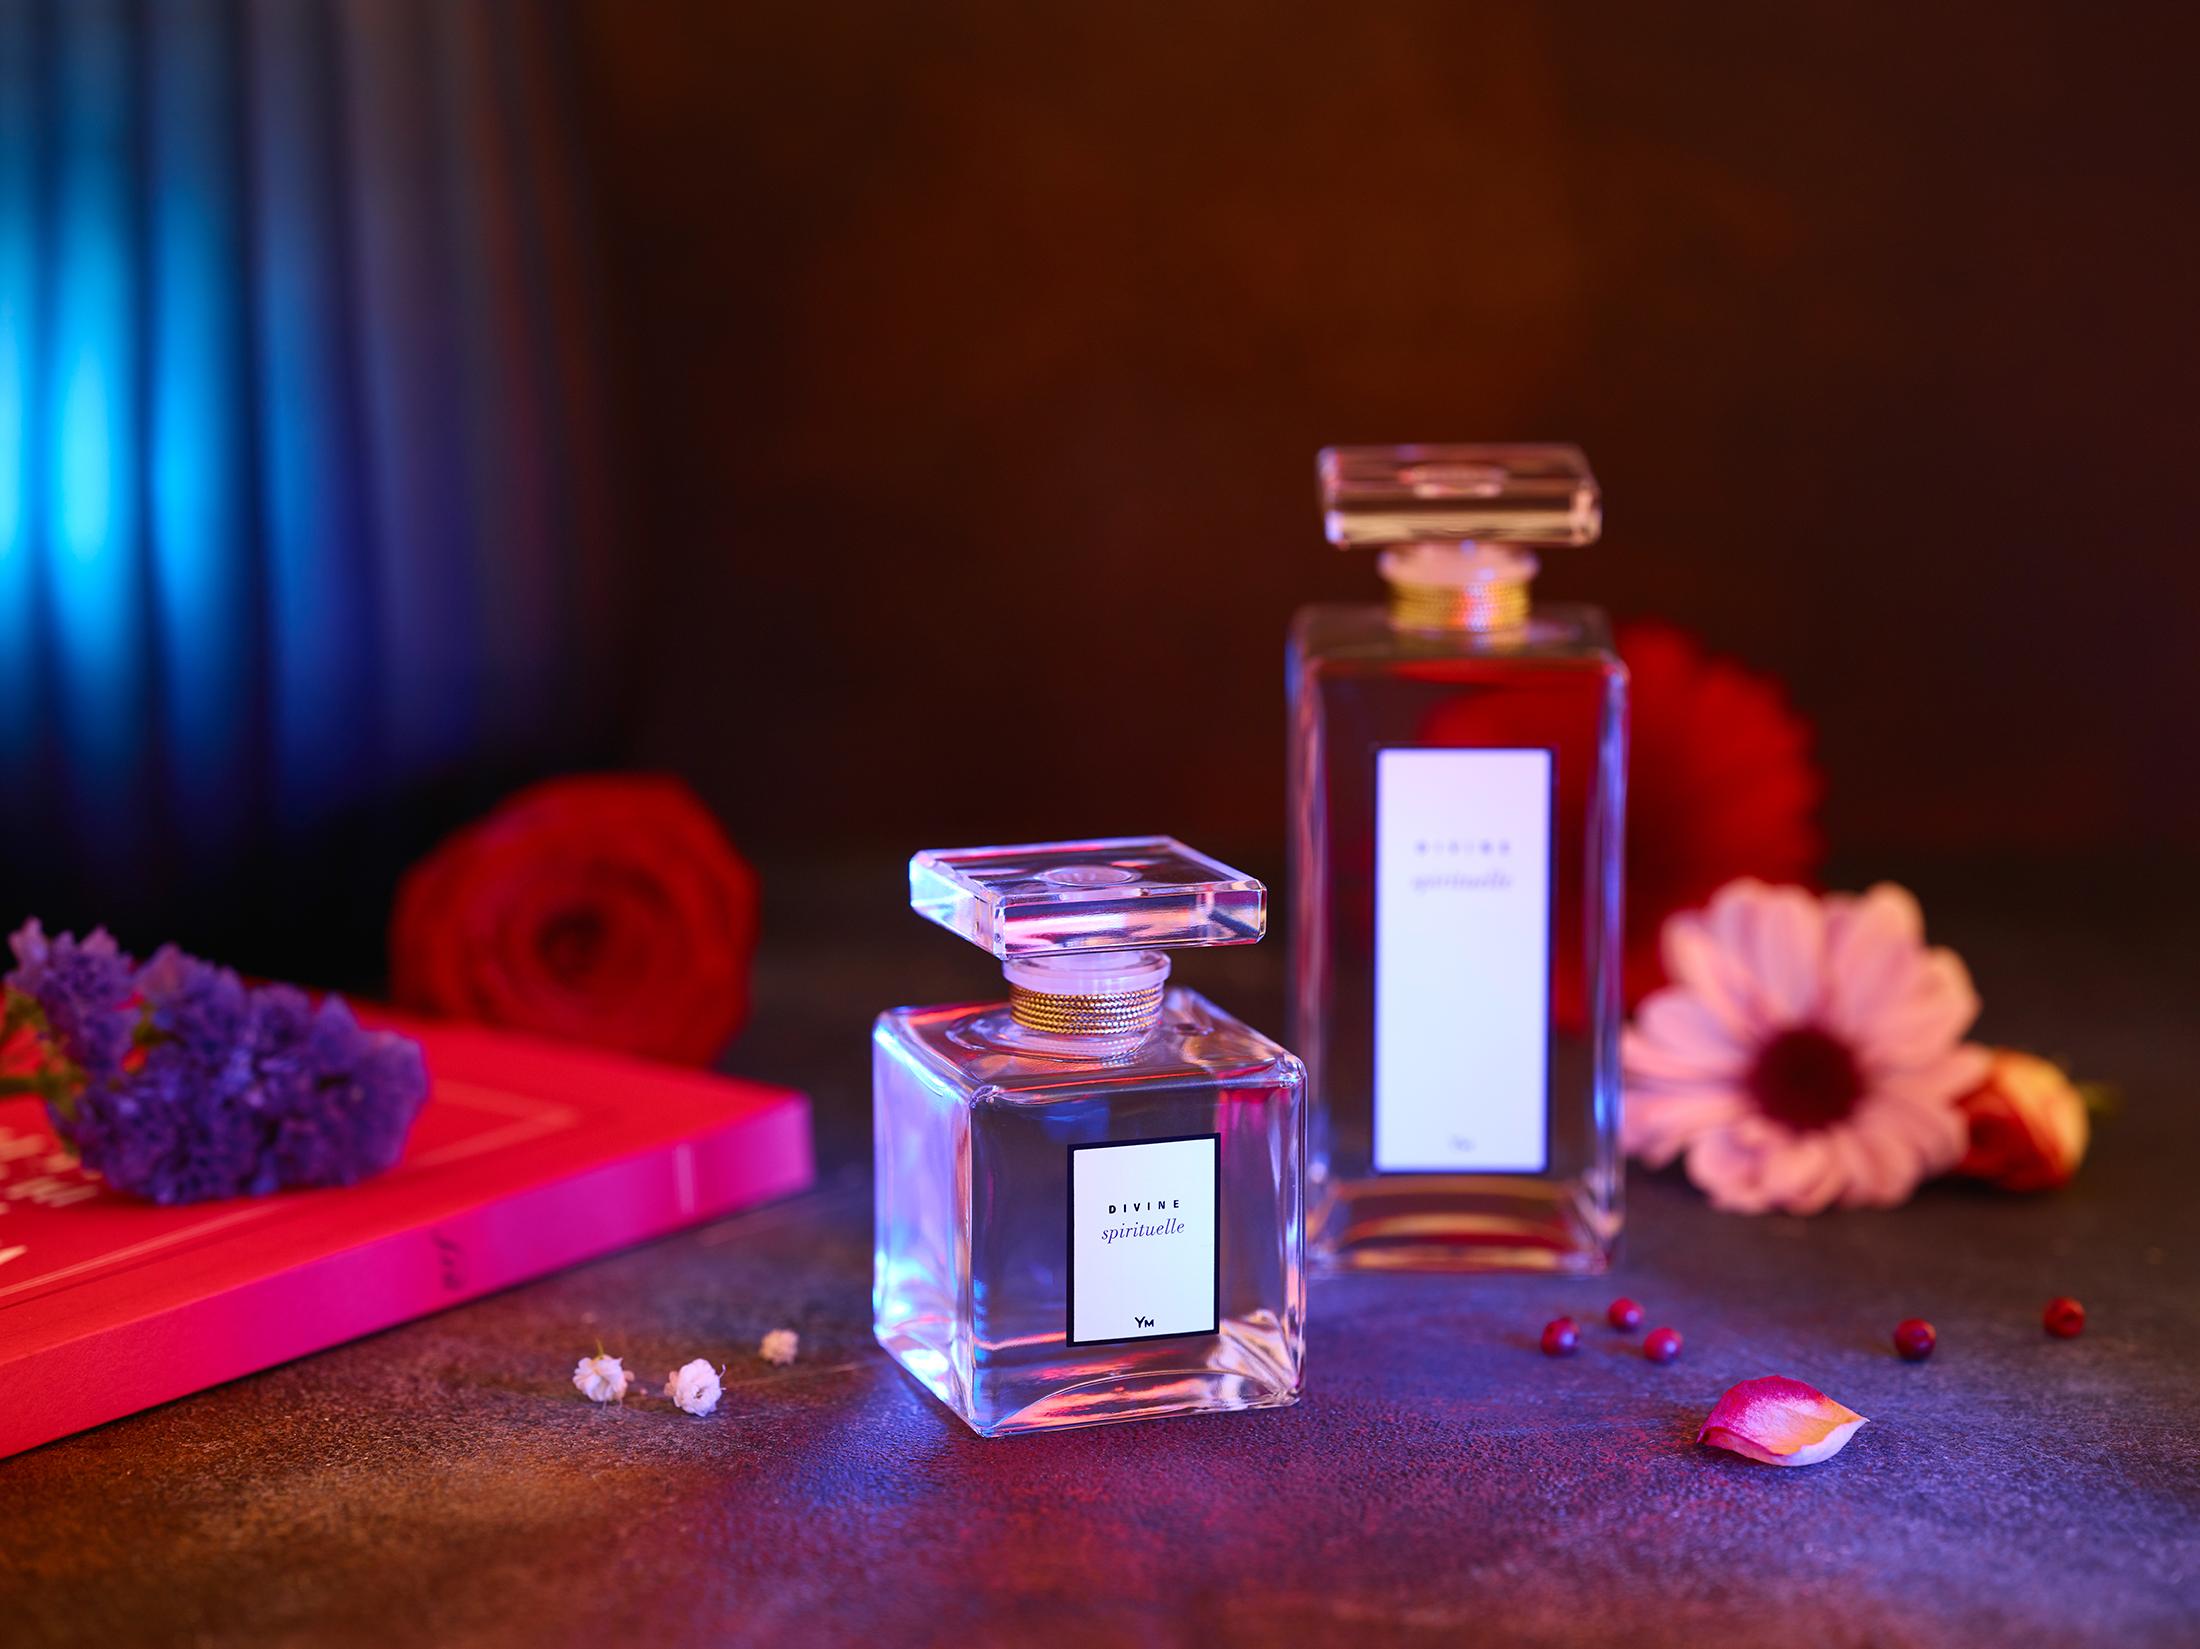 Creations spirituelle perfume